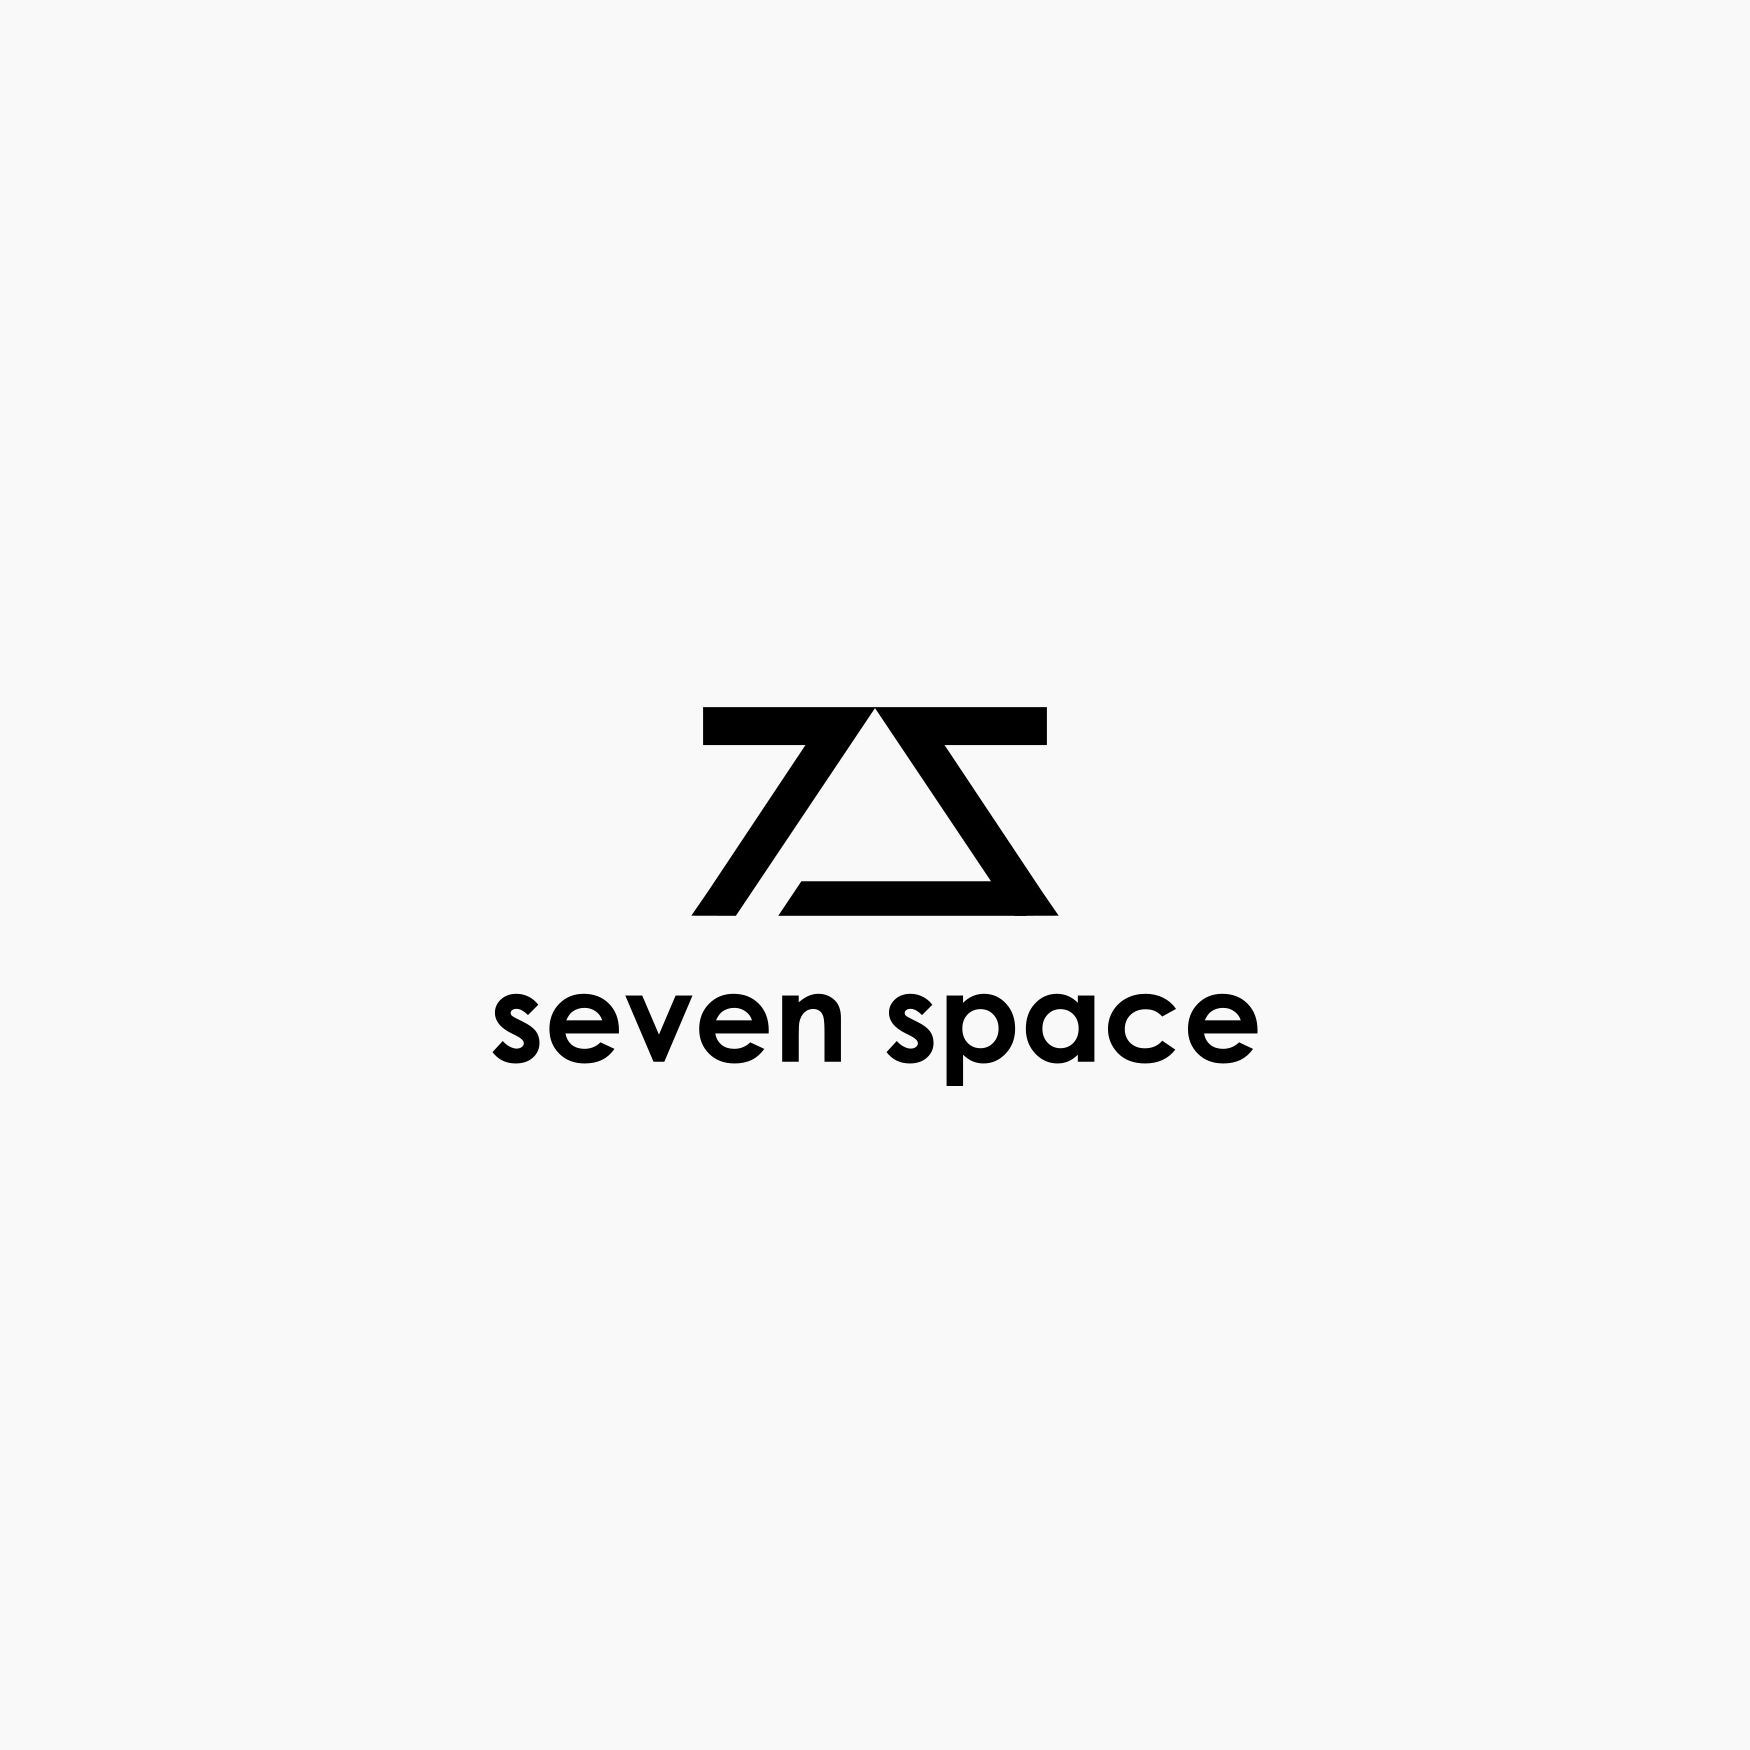 Логотип для Seven Space - дизайнер Daniel_Fedorov